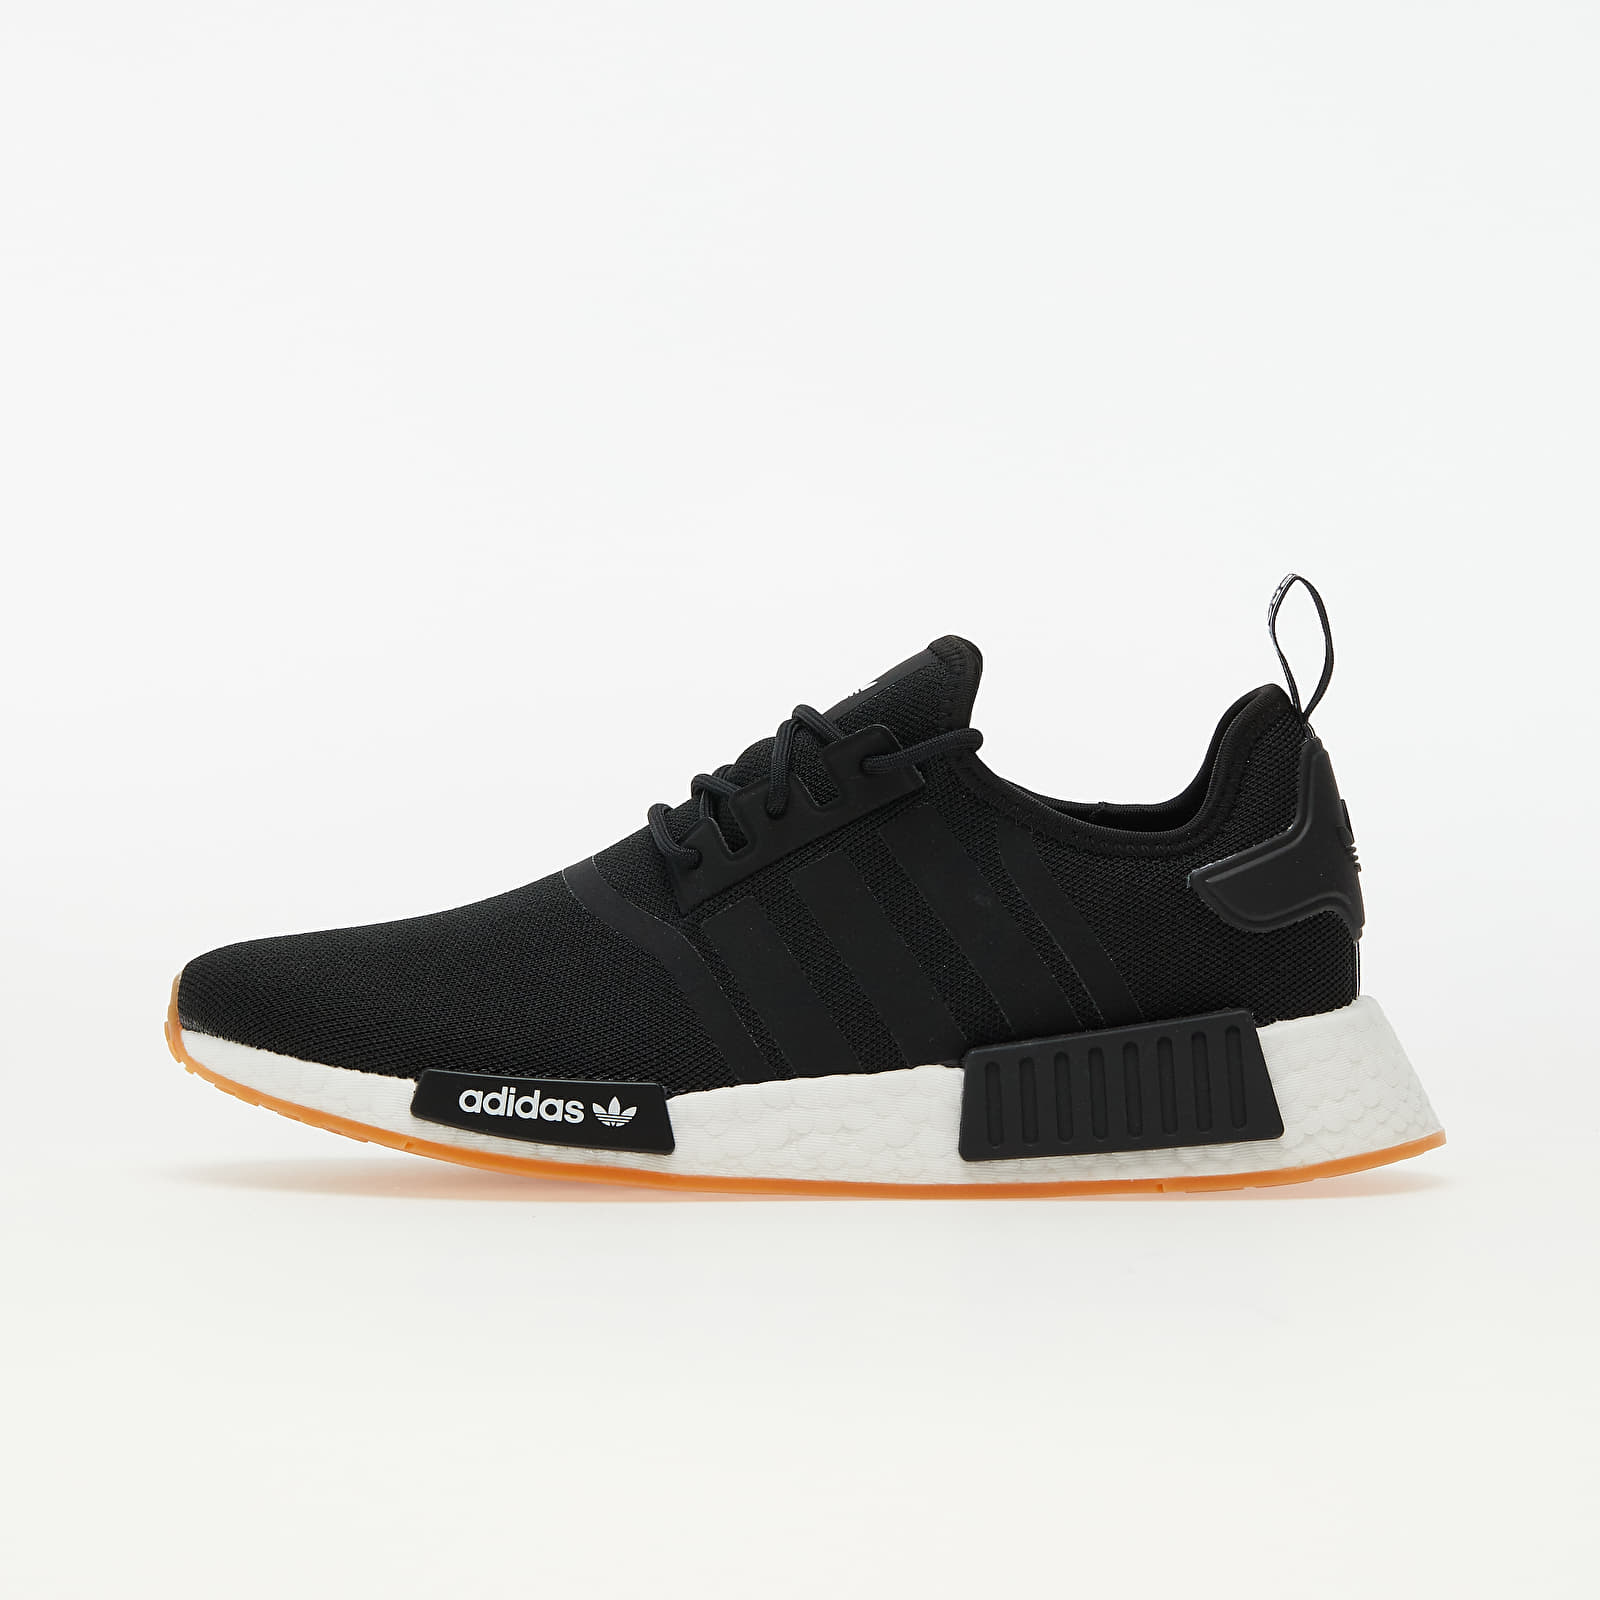 adidas NMD_R1 Primeblue Core Black/ Core Black/ Gum2 EUR 38